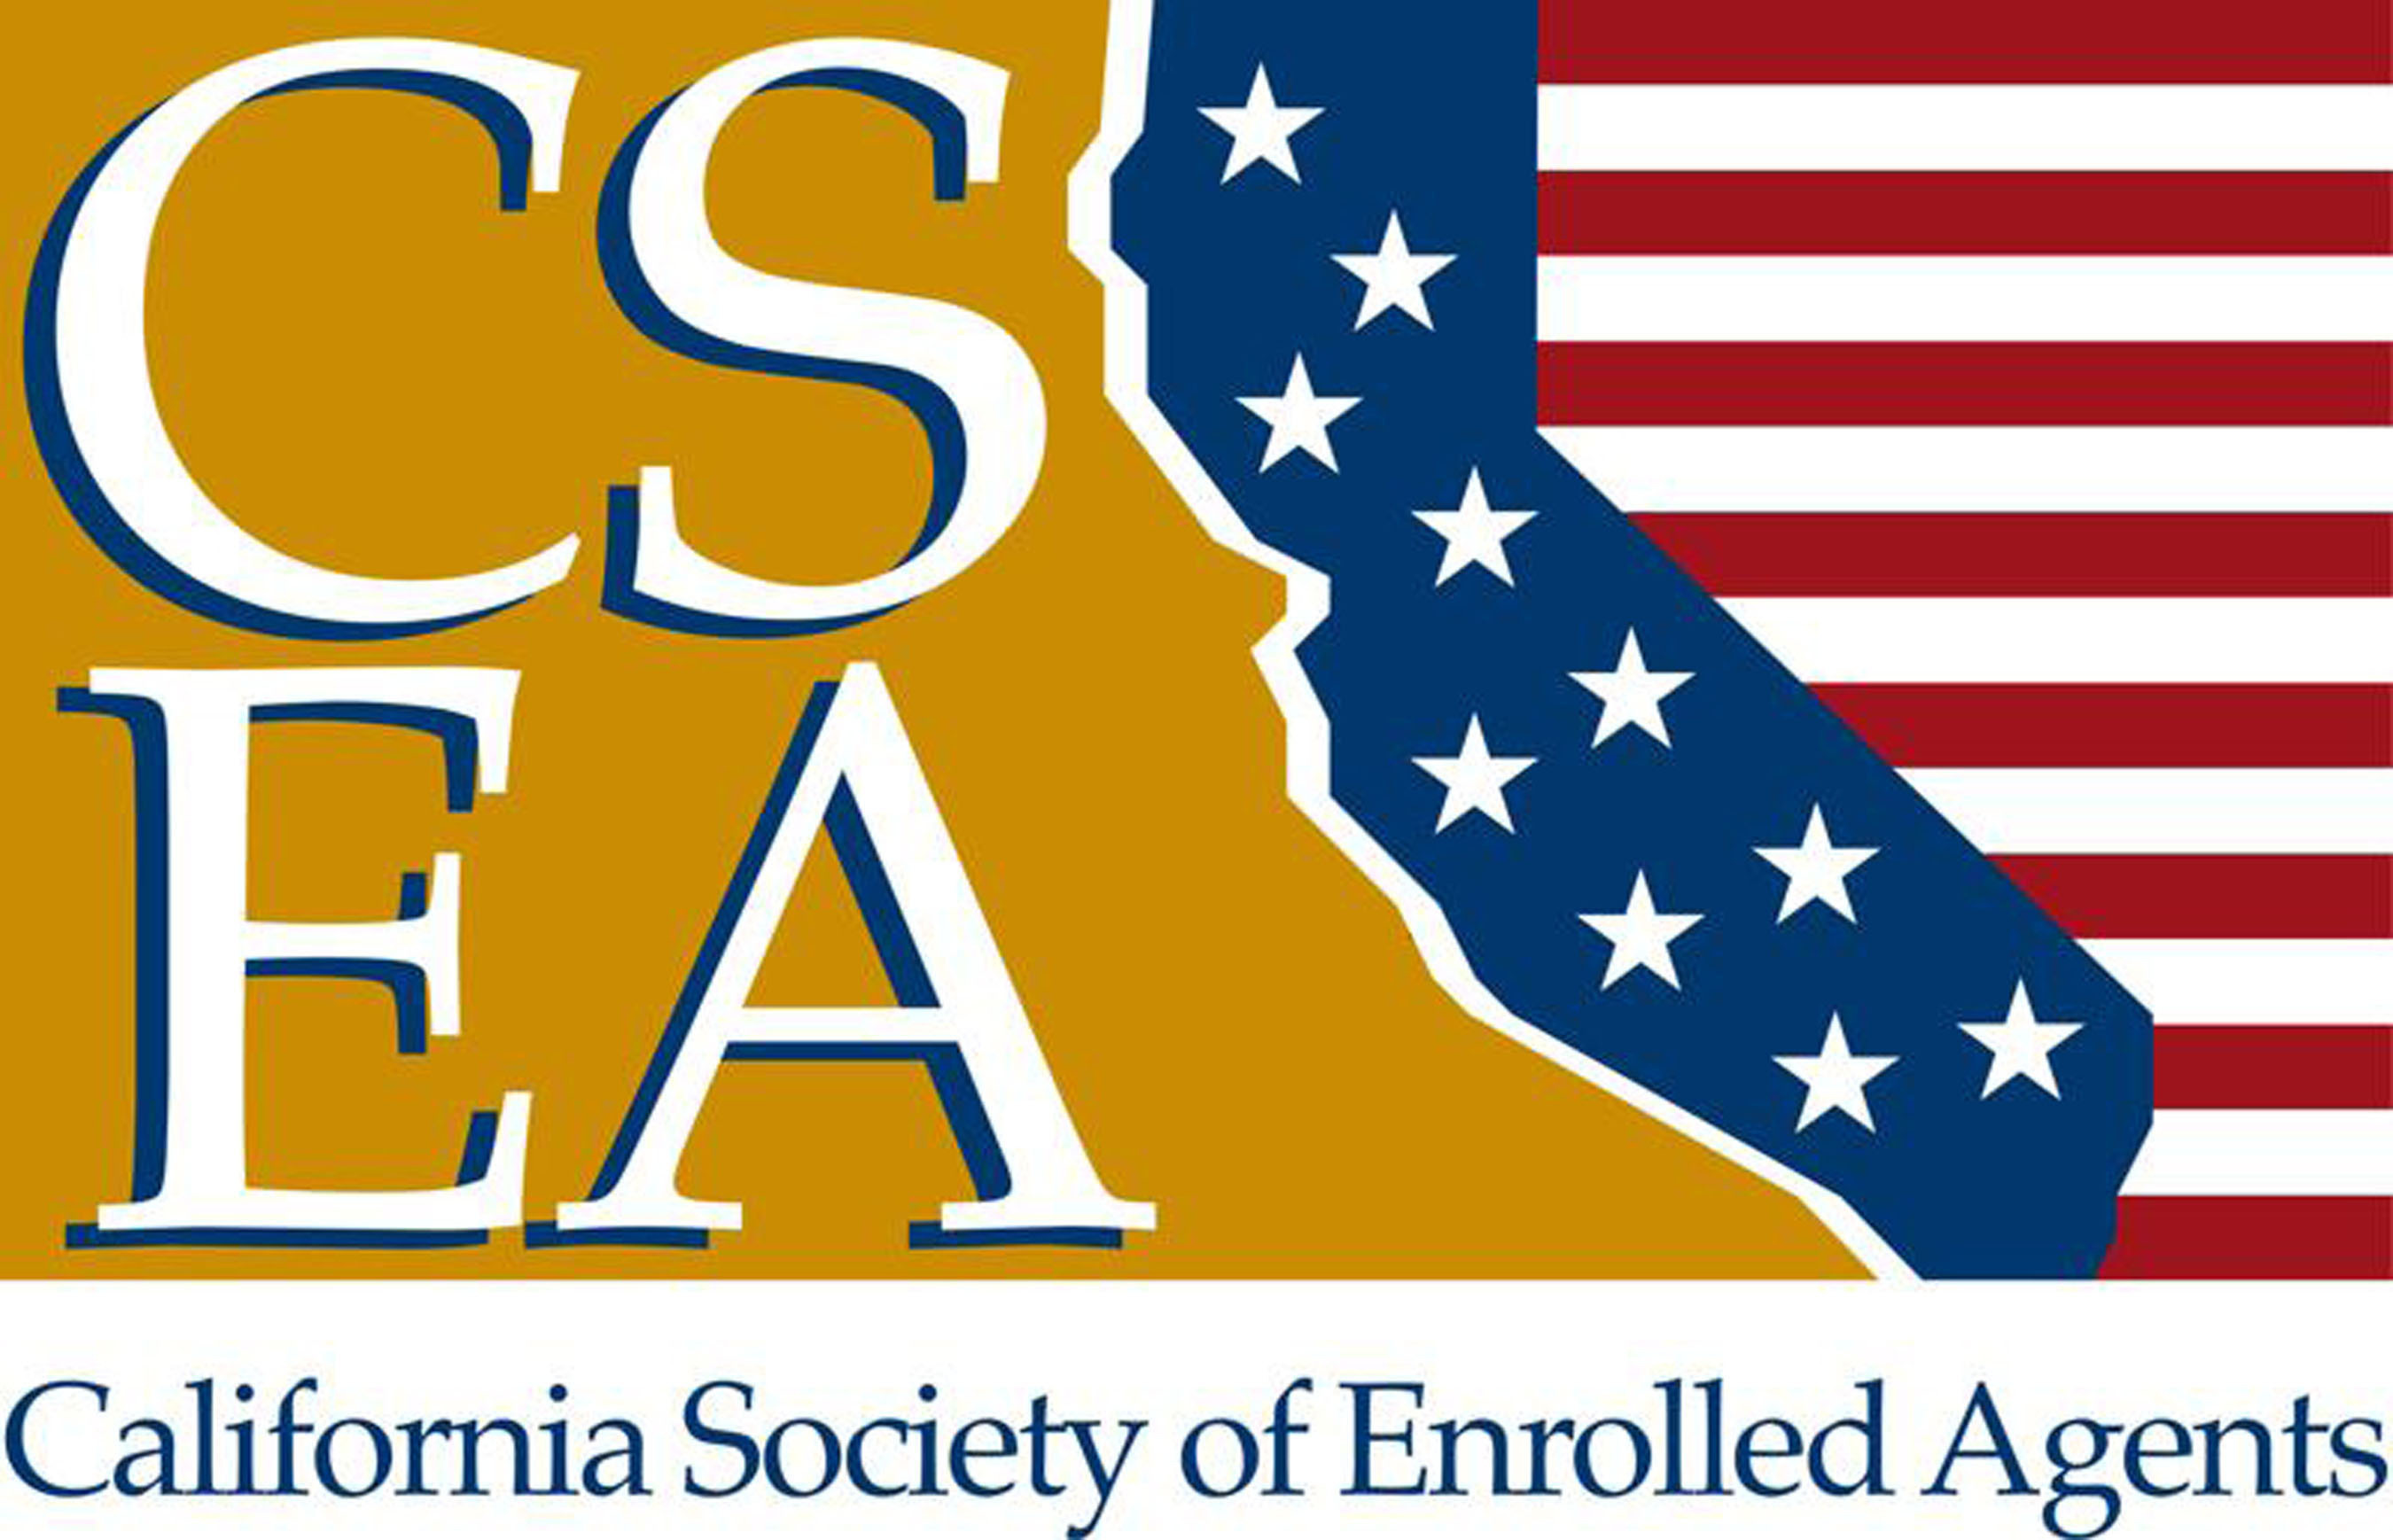 California Society of Enrolled Agents Logo.